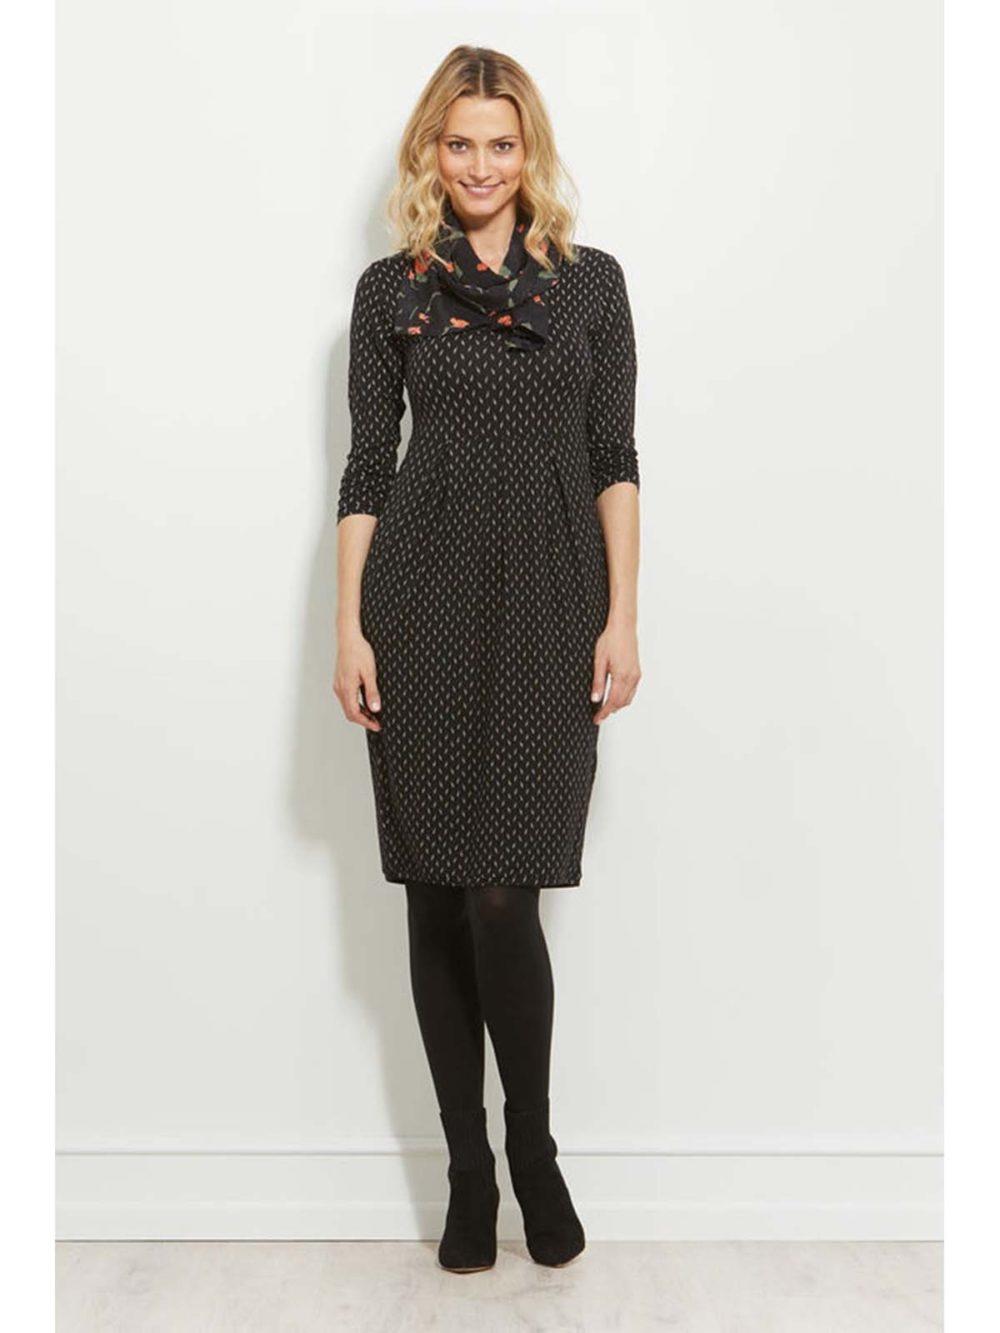 Nova Dress Masai Katie Kerr Women's Clothing